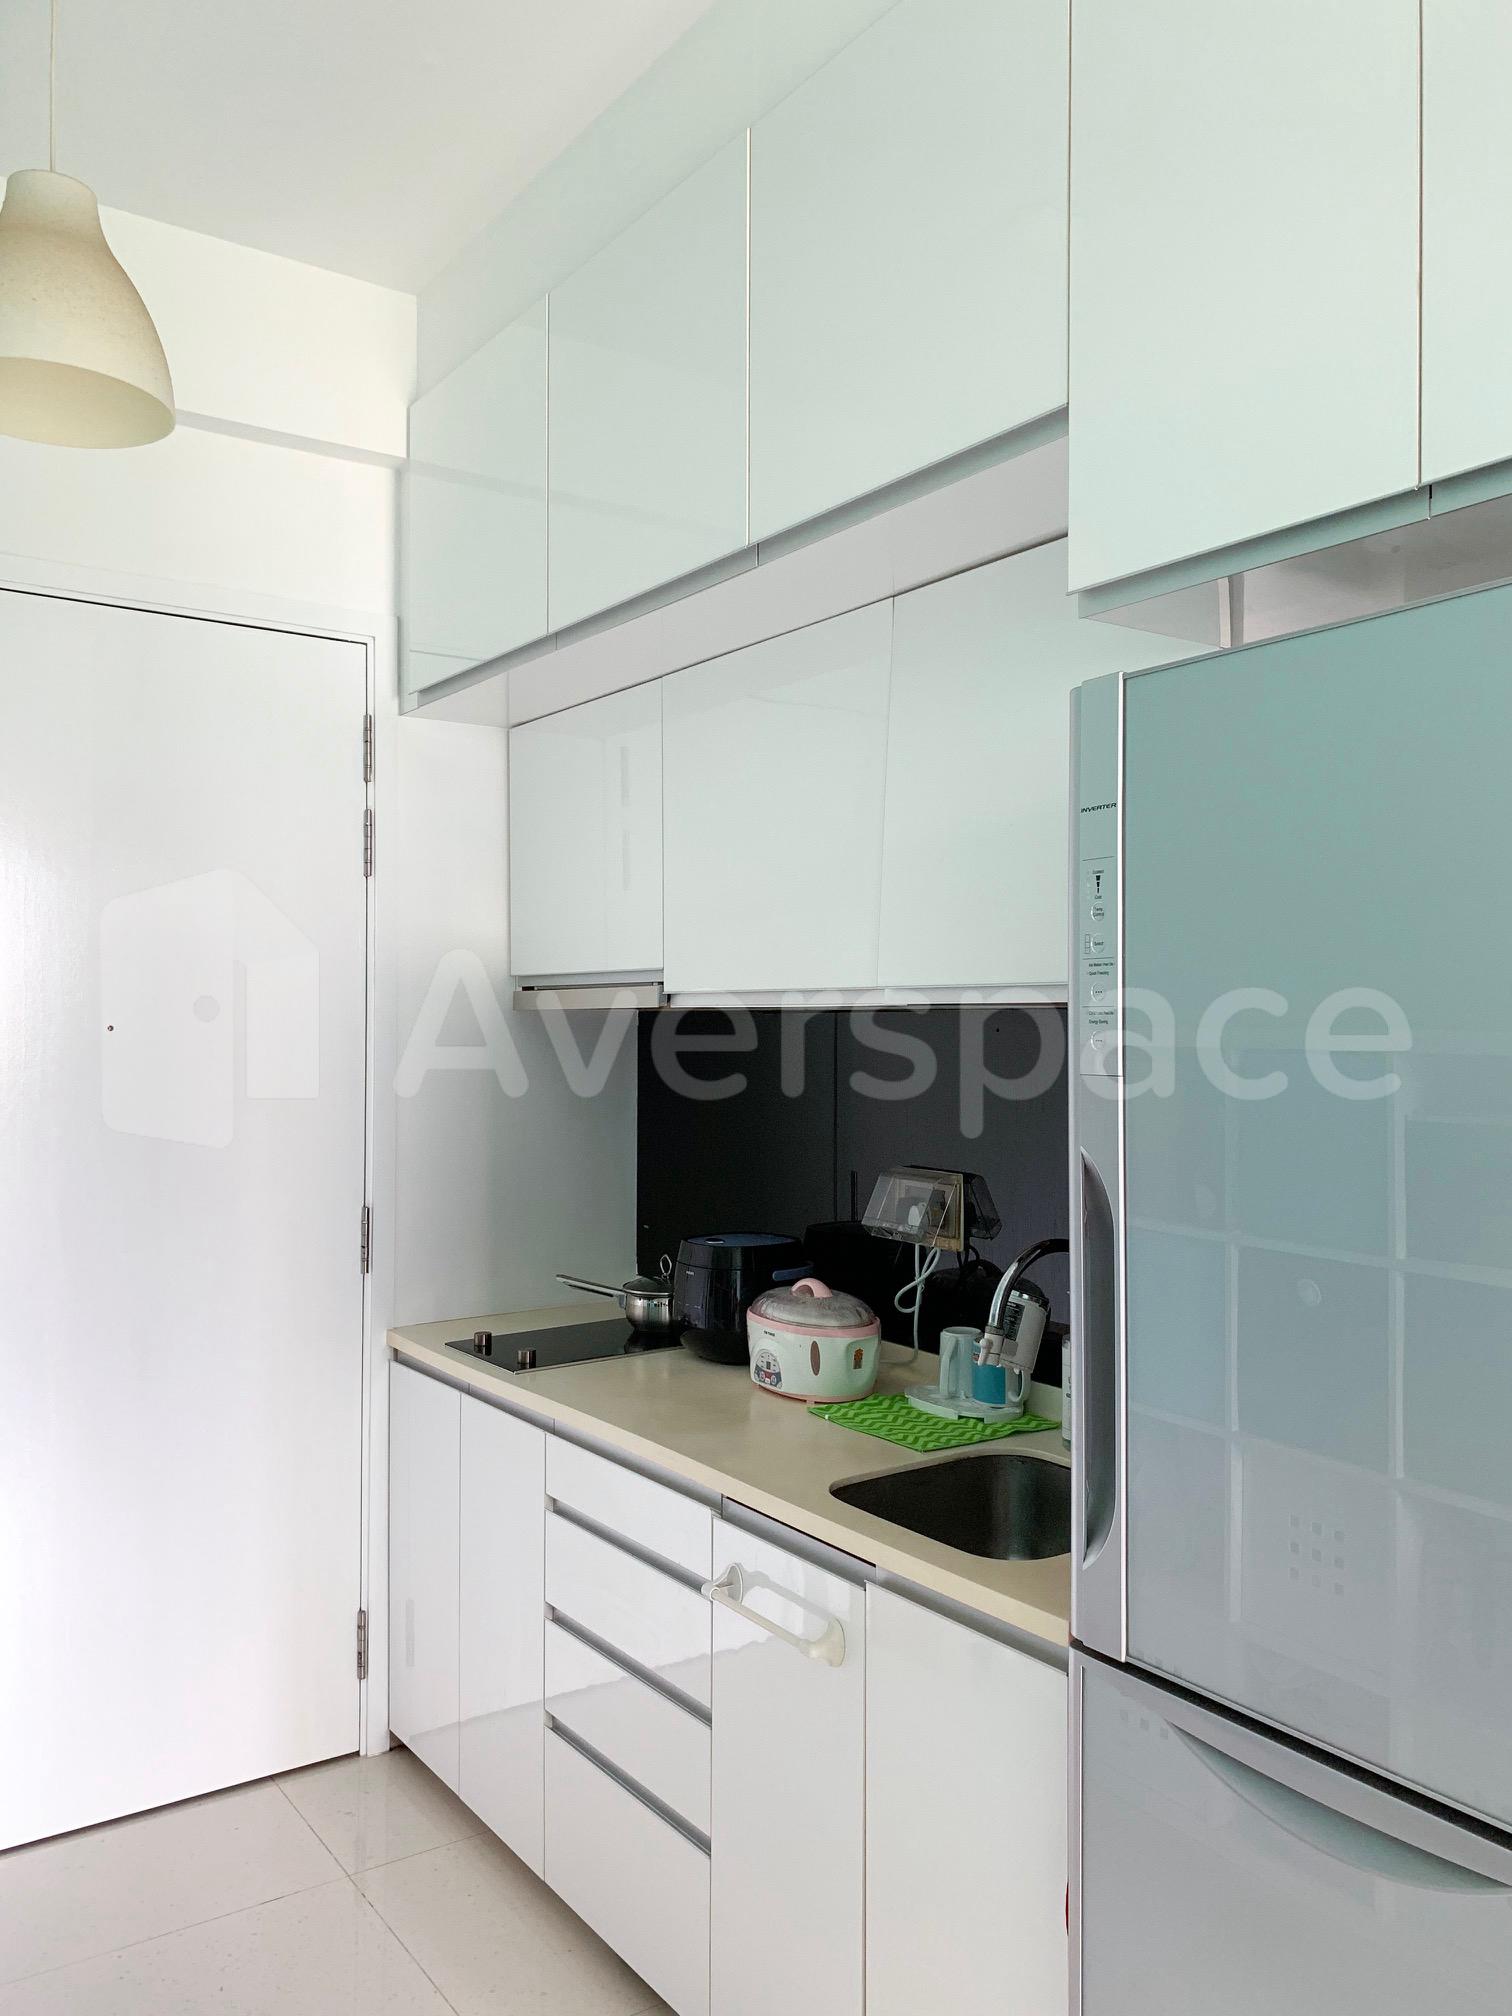 468 Sims Avenue, District 14 Singapore